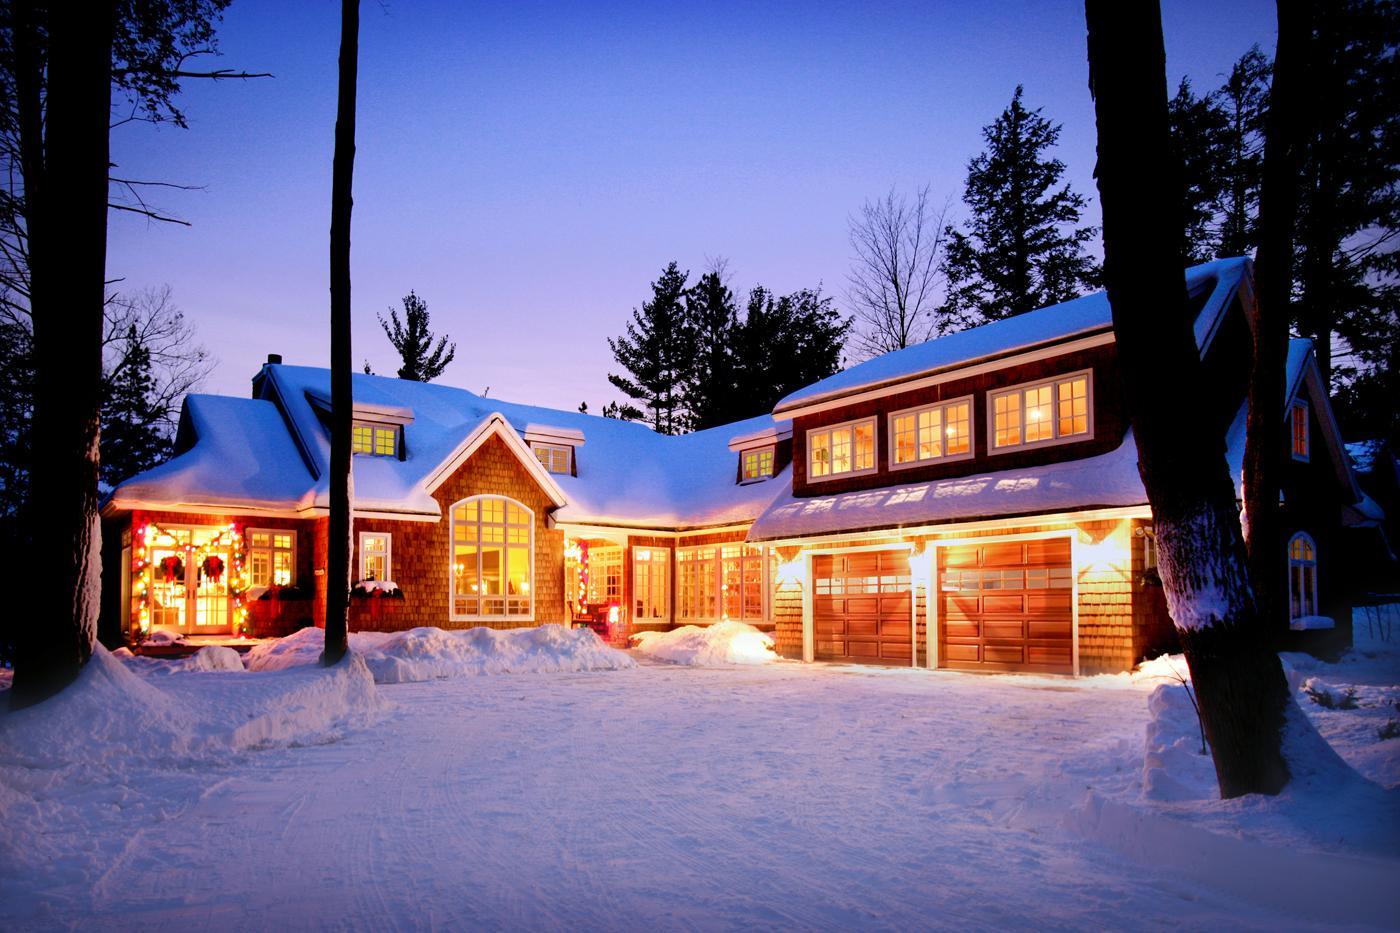 Custom Home in Michigan's Winter Wonderland - Butcher